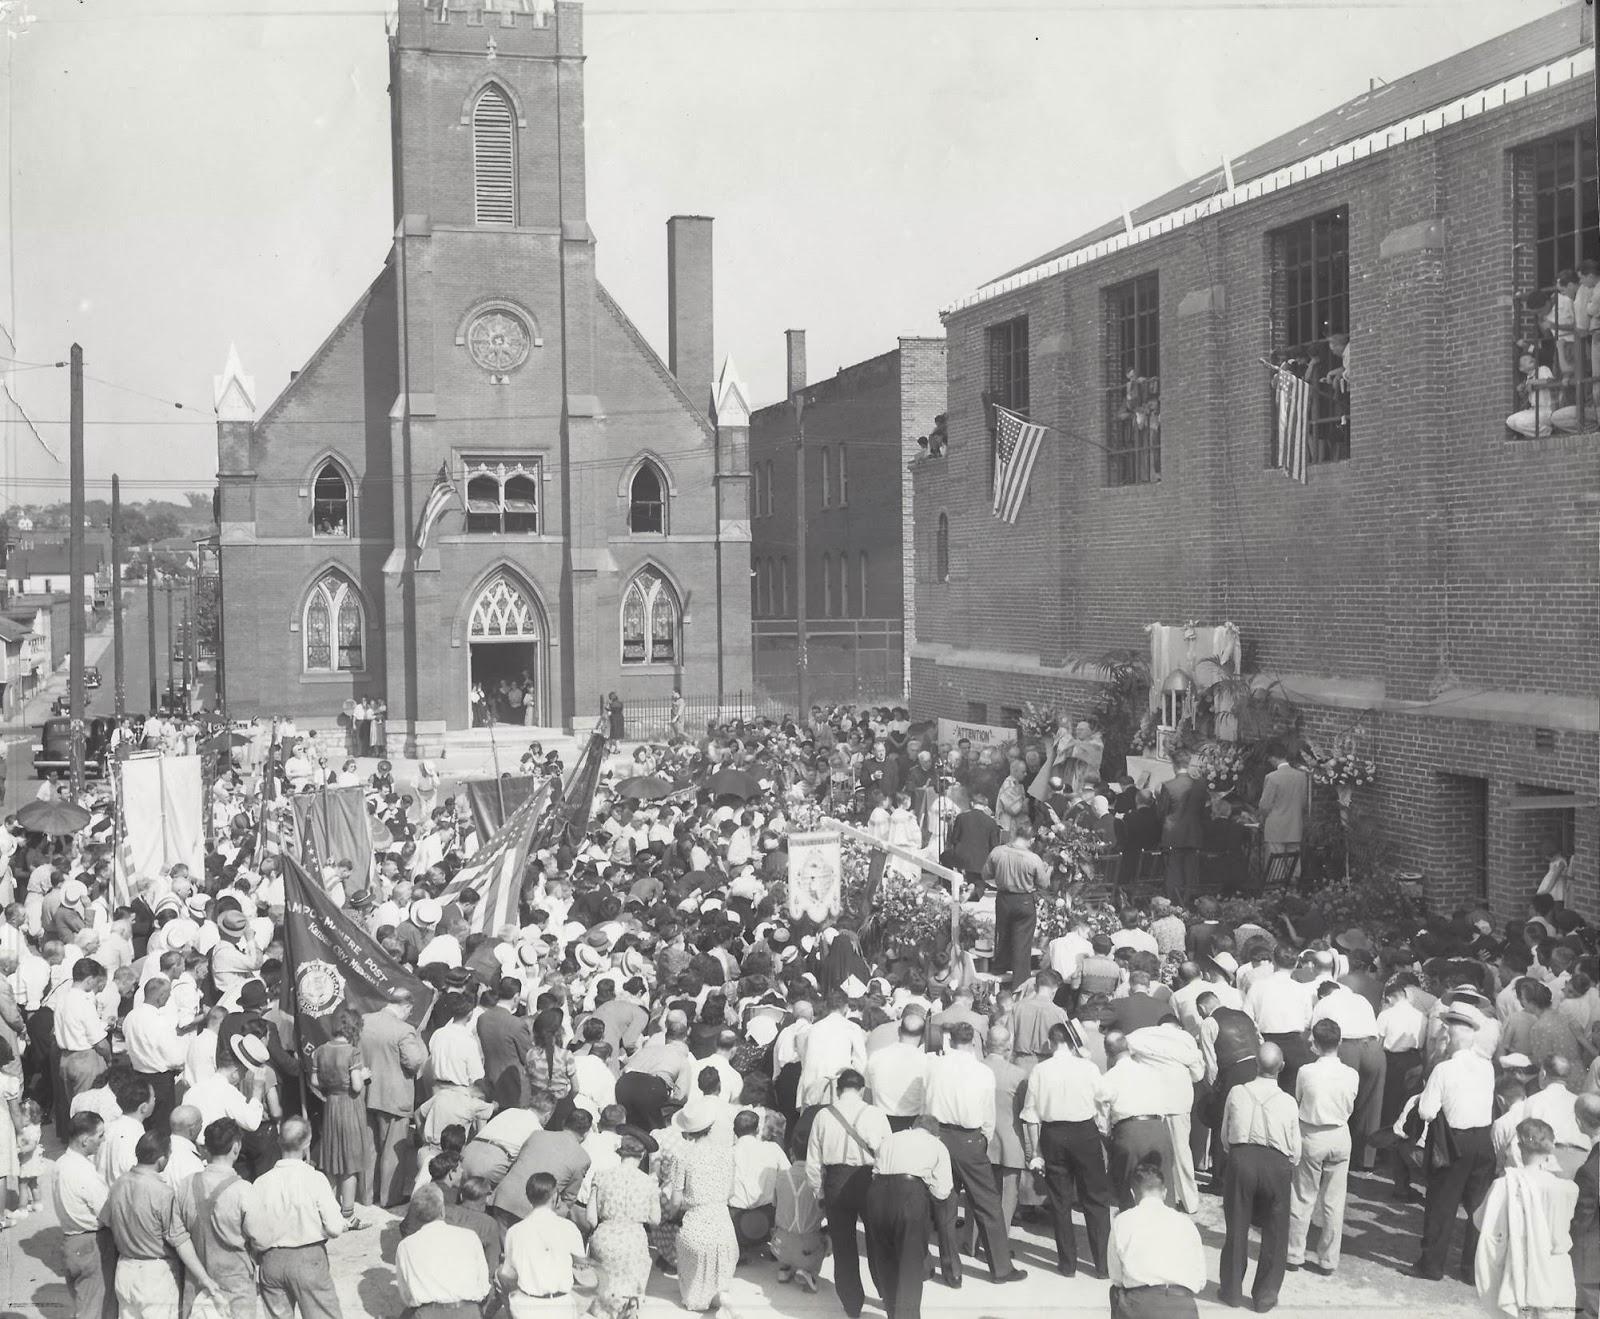 Dedication of the Don Bosco Community Center